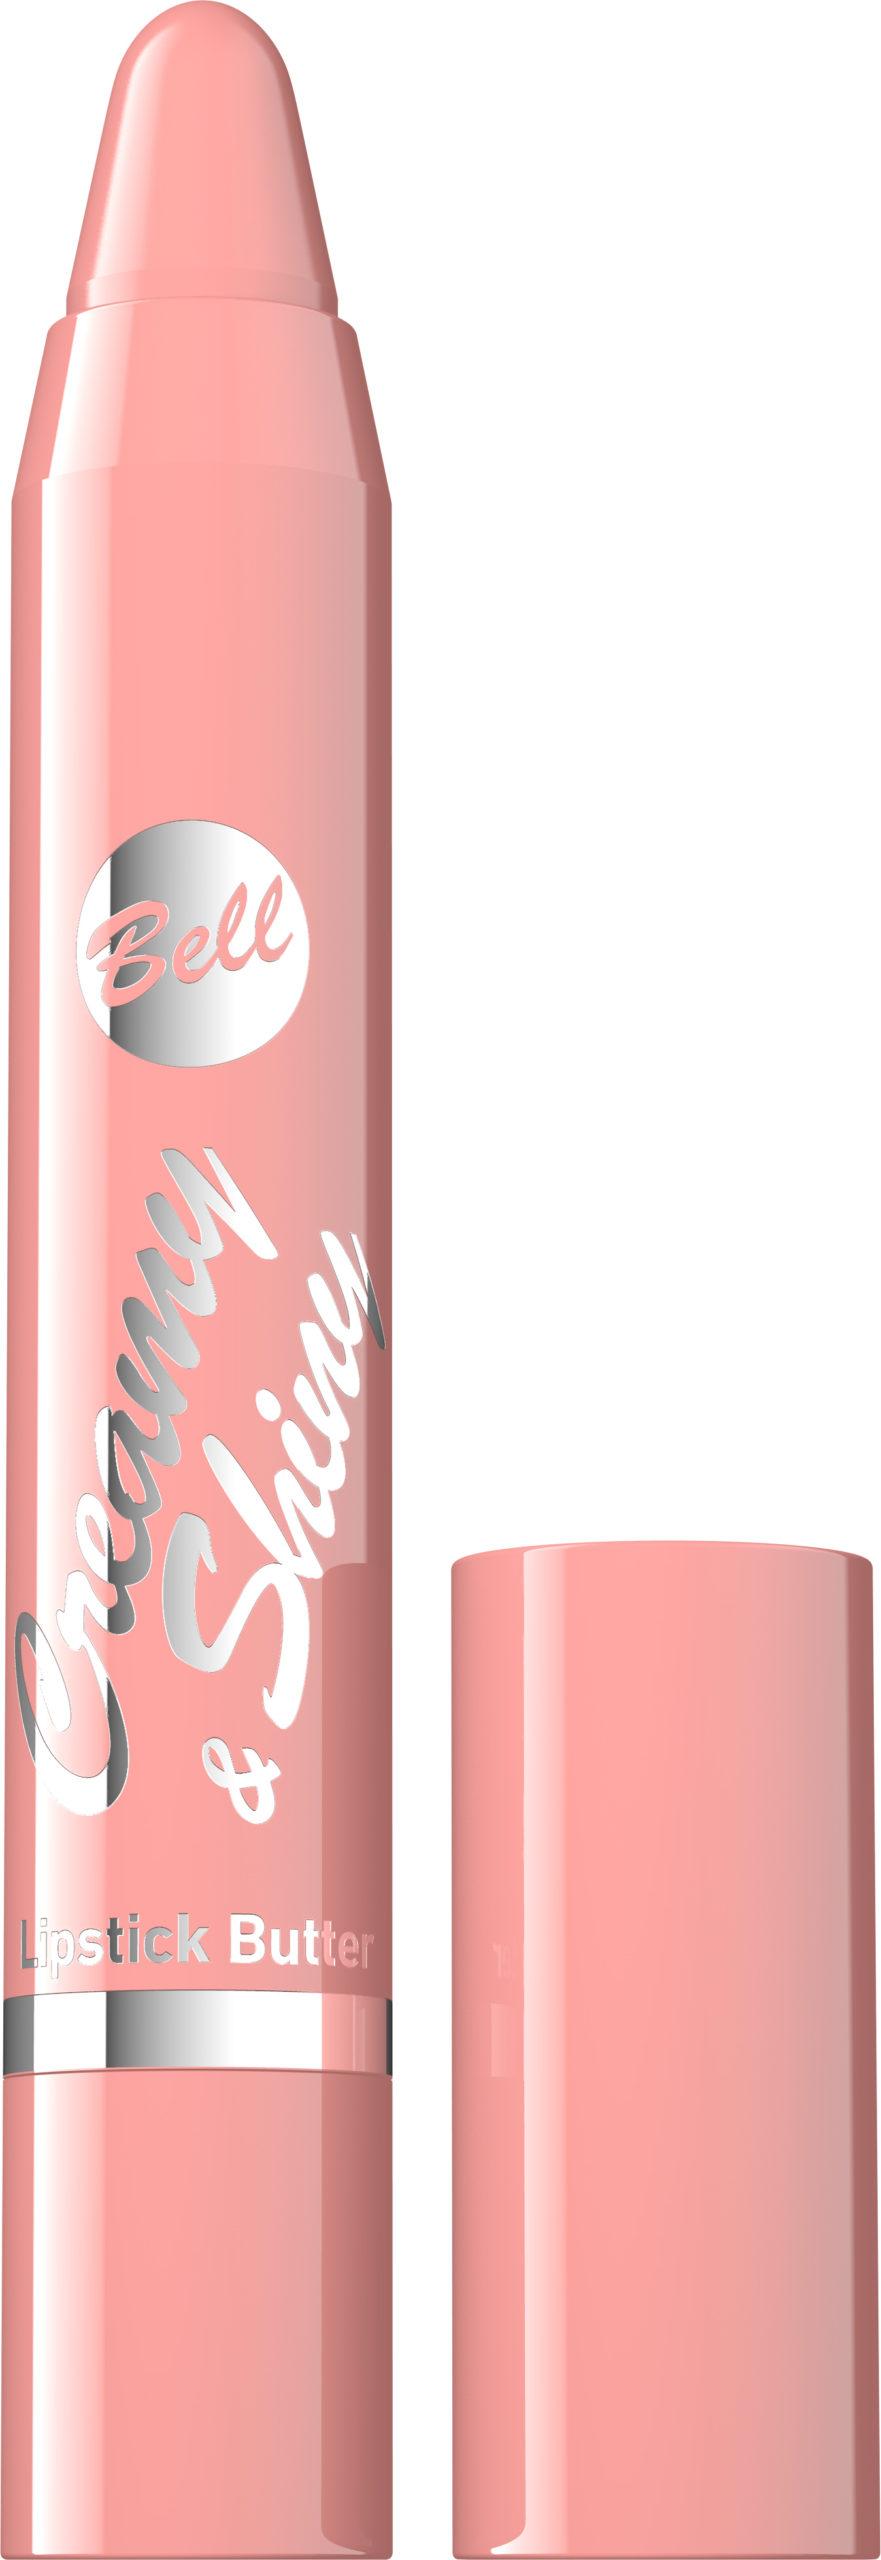 Creamy&Shiny Lipstick Butter